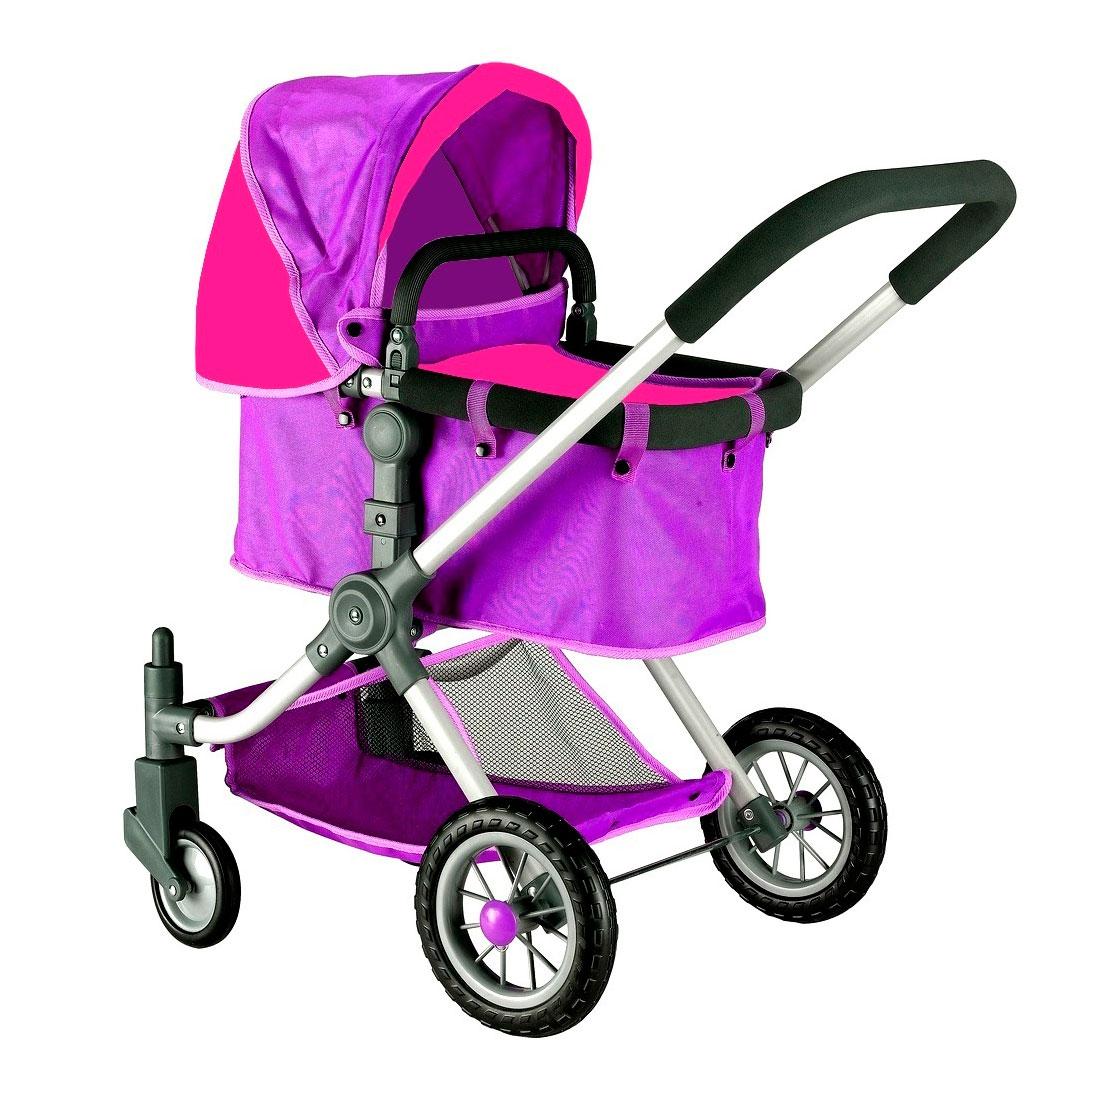 Кукольная коляска RT 646 Фиолетовый и фуксия<br>